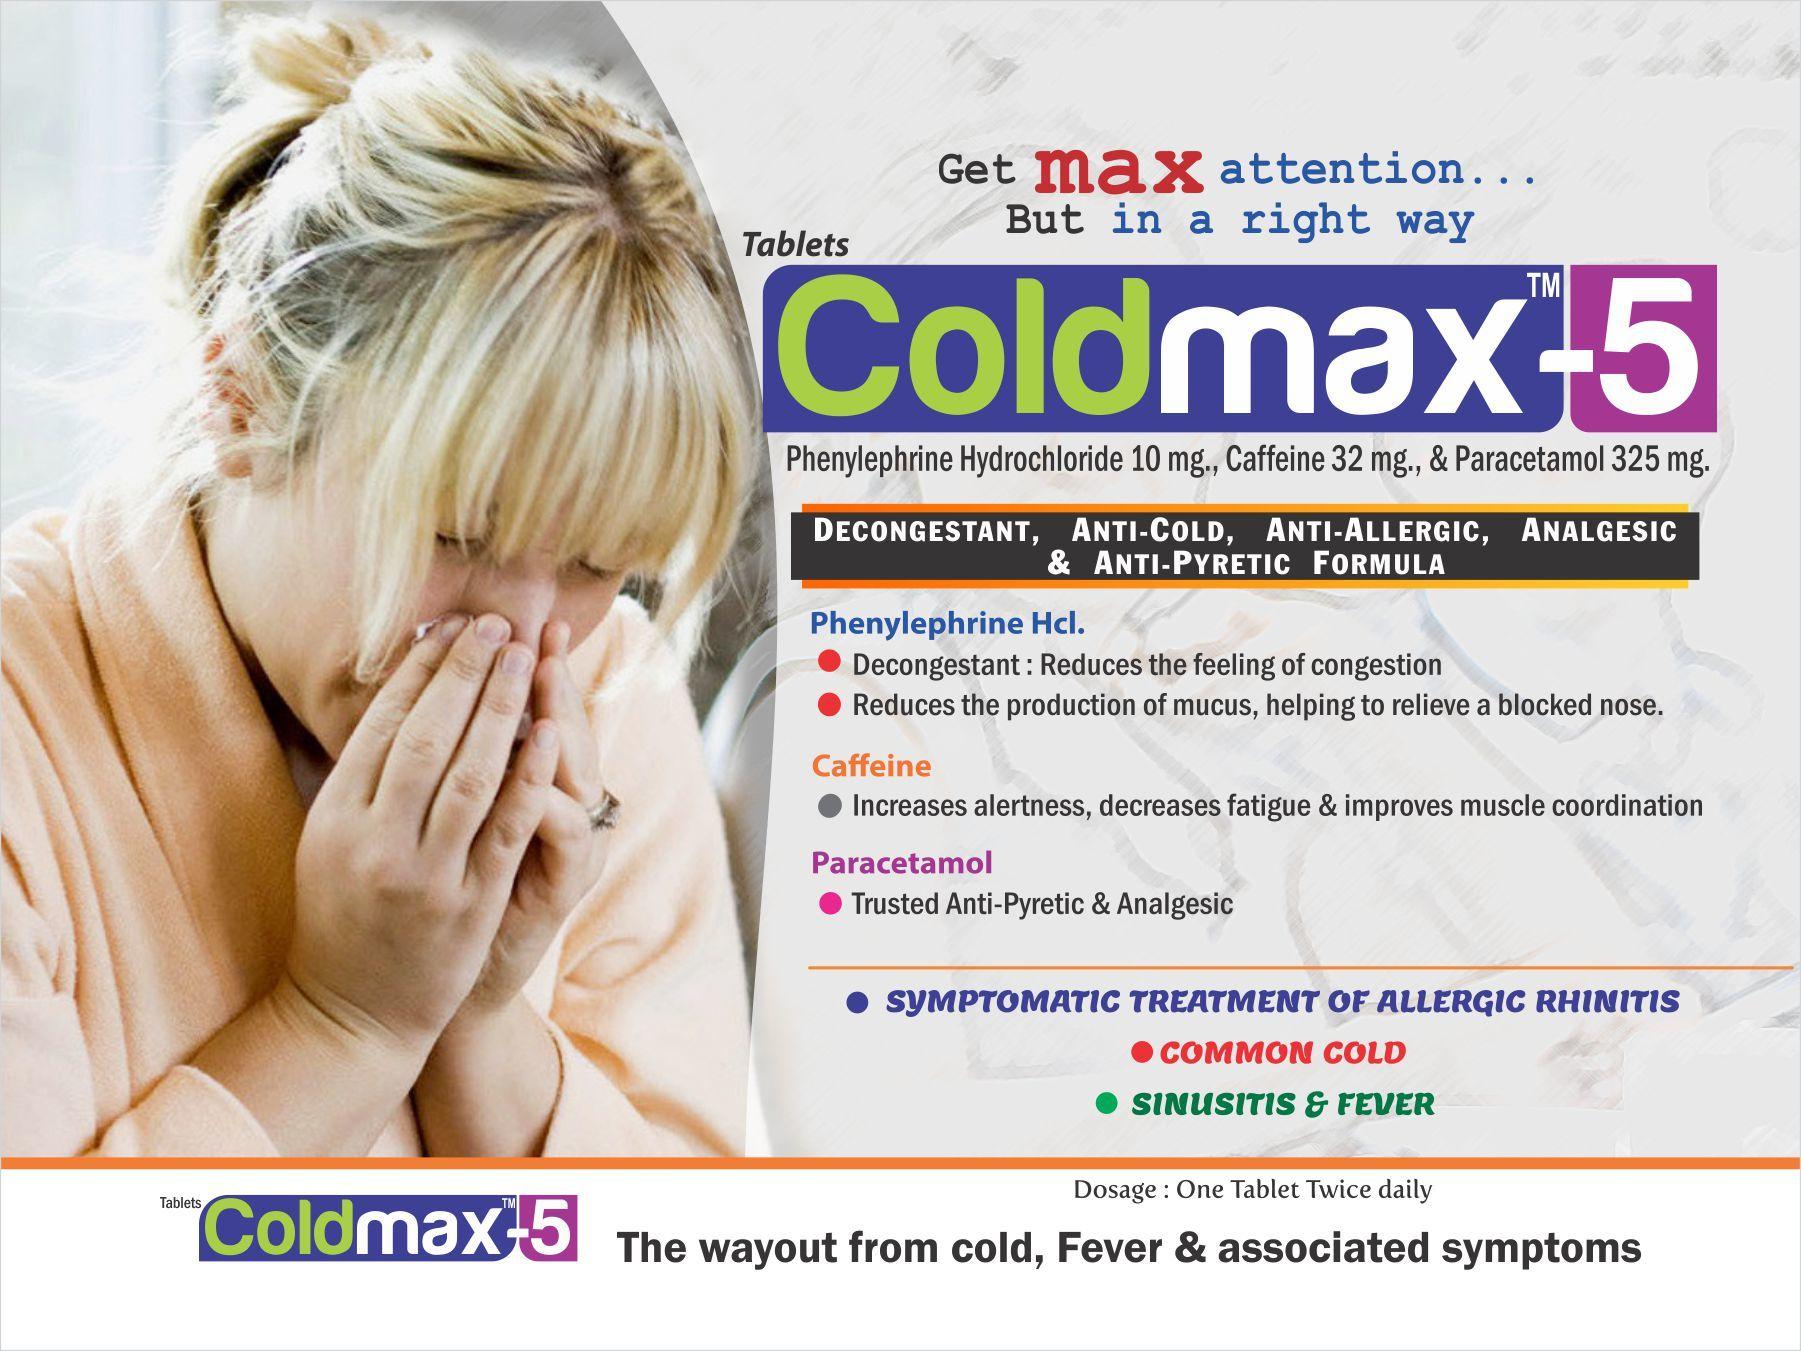 Phenylephrine 10 mg, Paracetamol 325 mg & Caffeine 32 mg